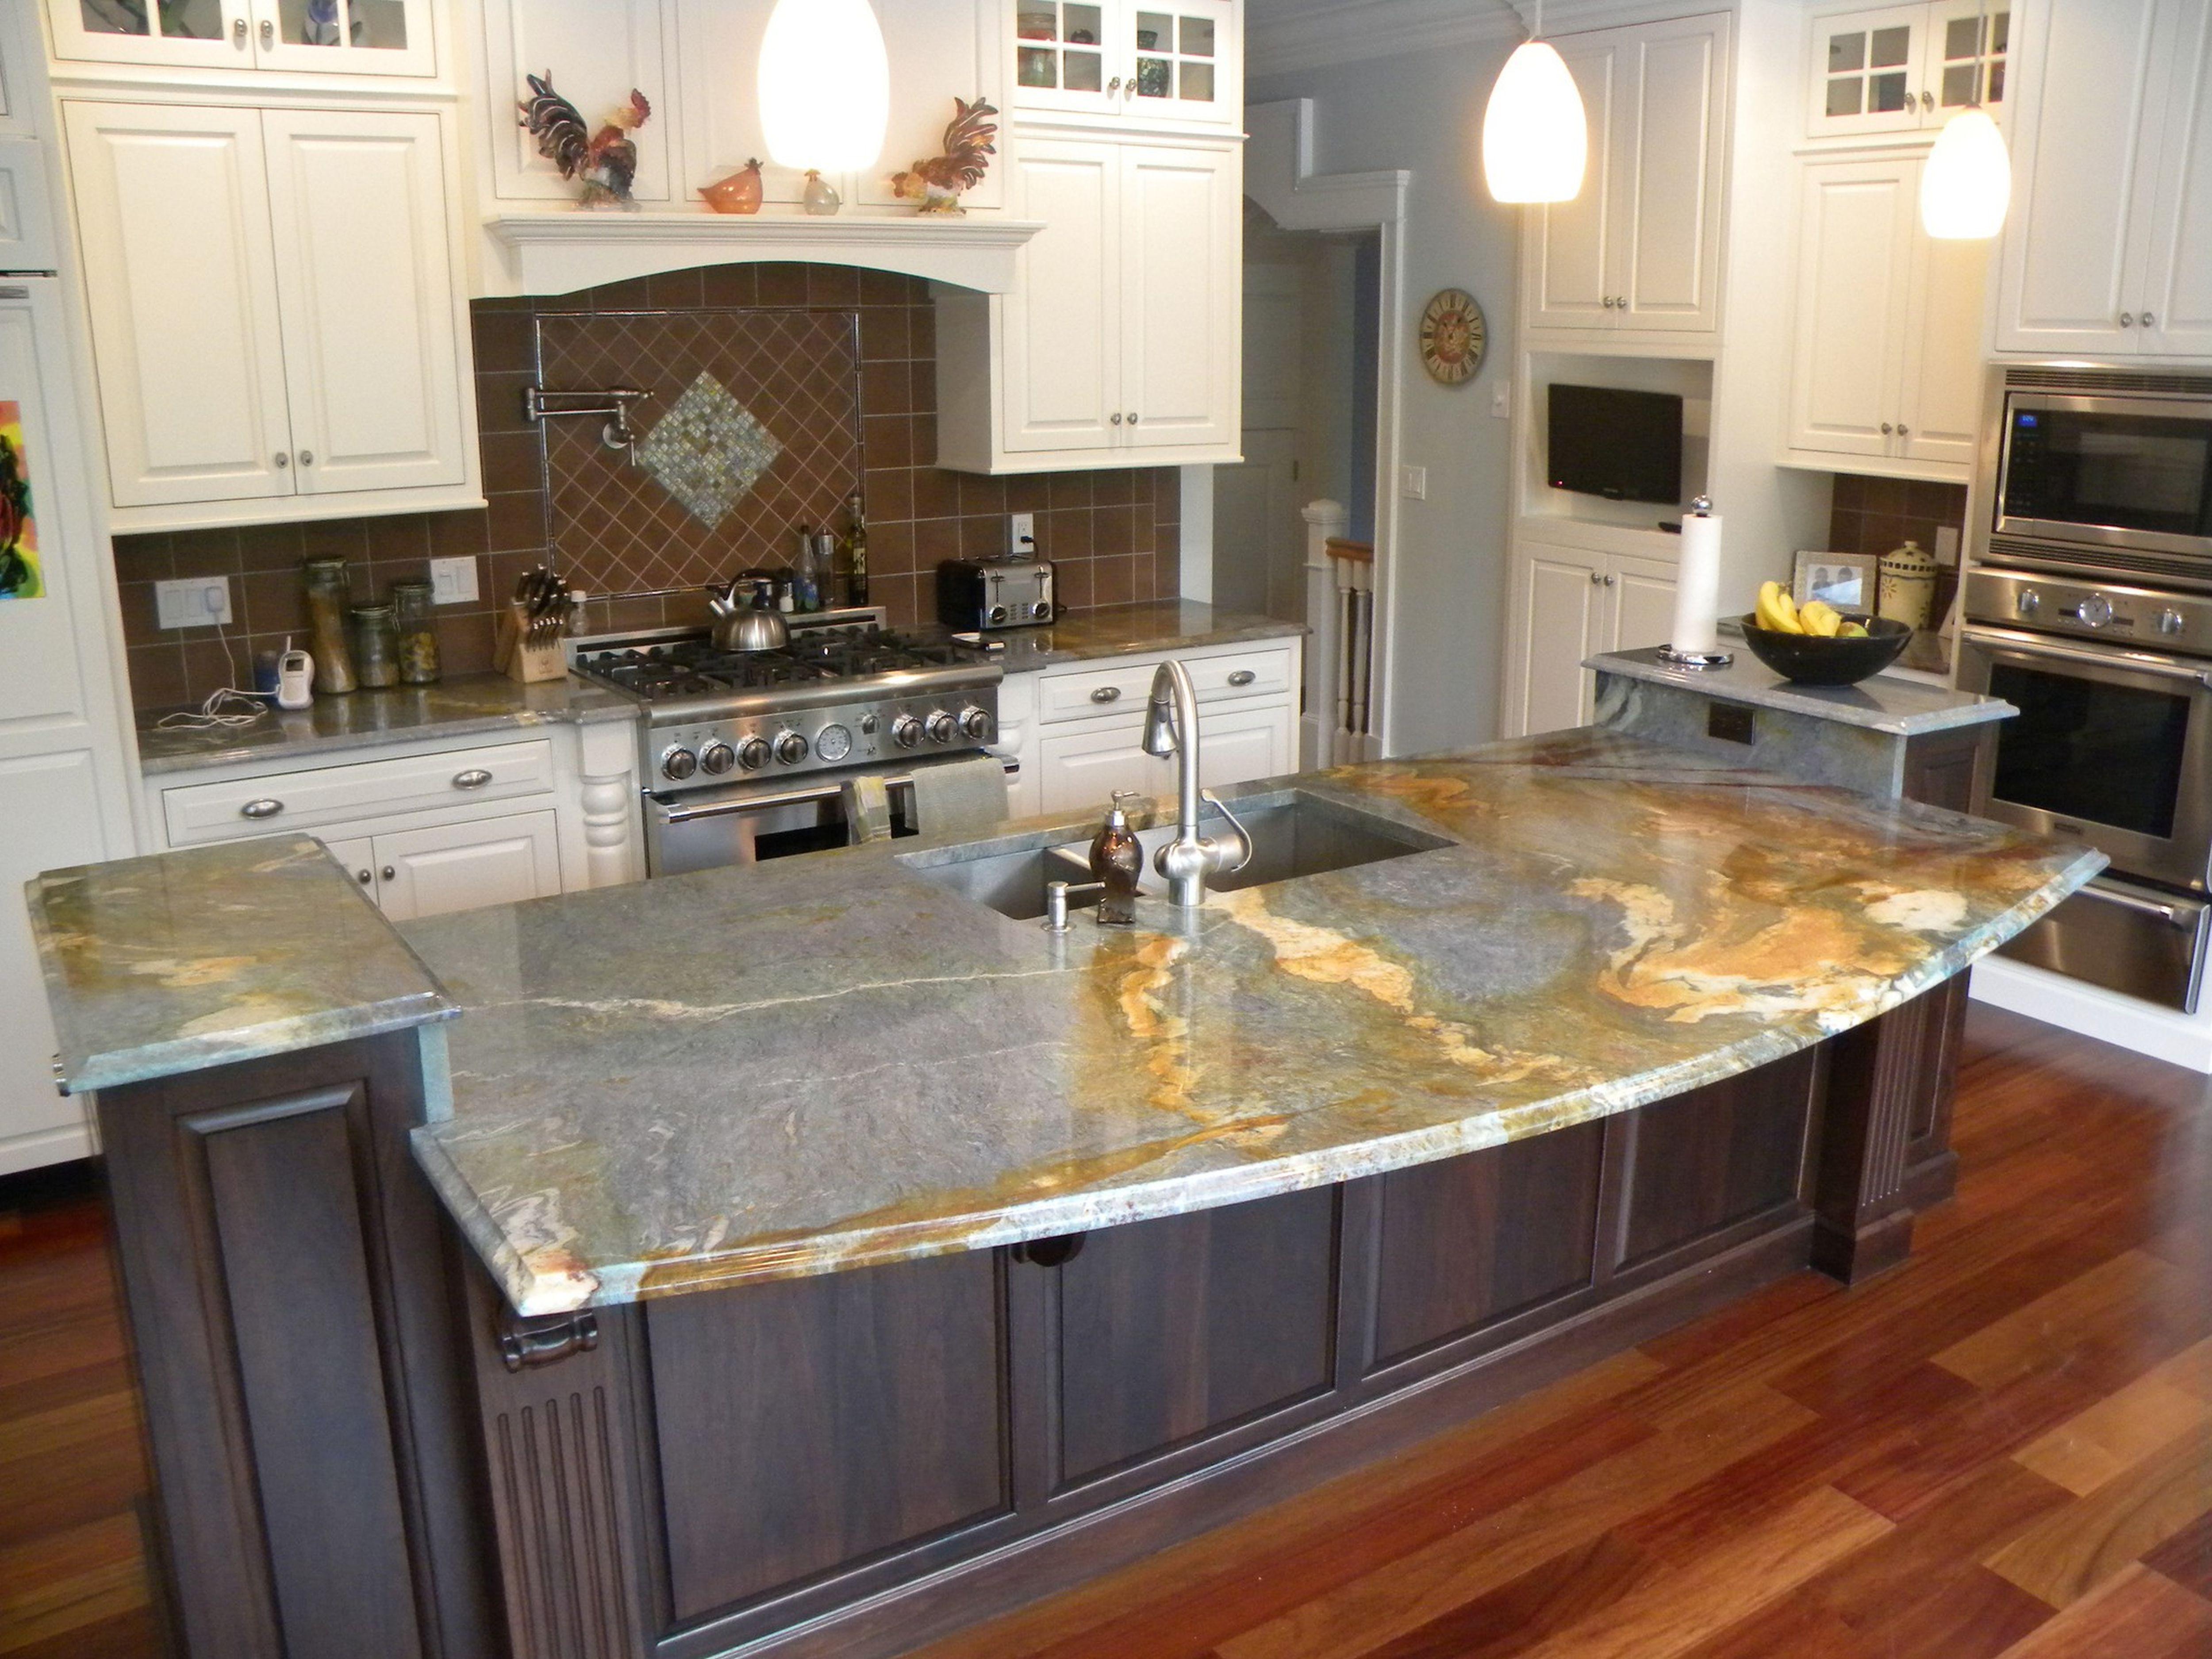 Delicieux Marble Kitchen Countertop White Cabinet Elegant Chandelier Steel Sink